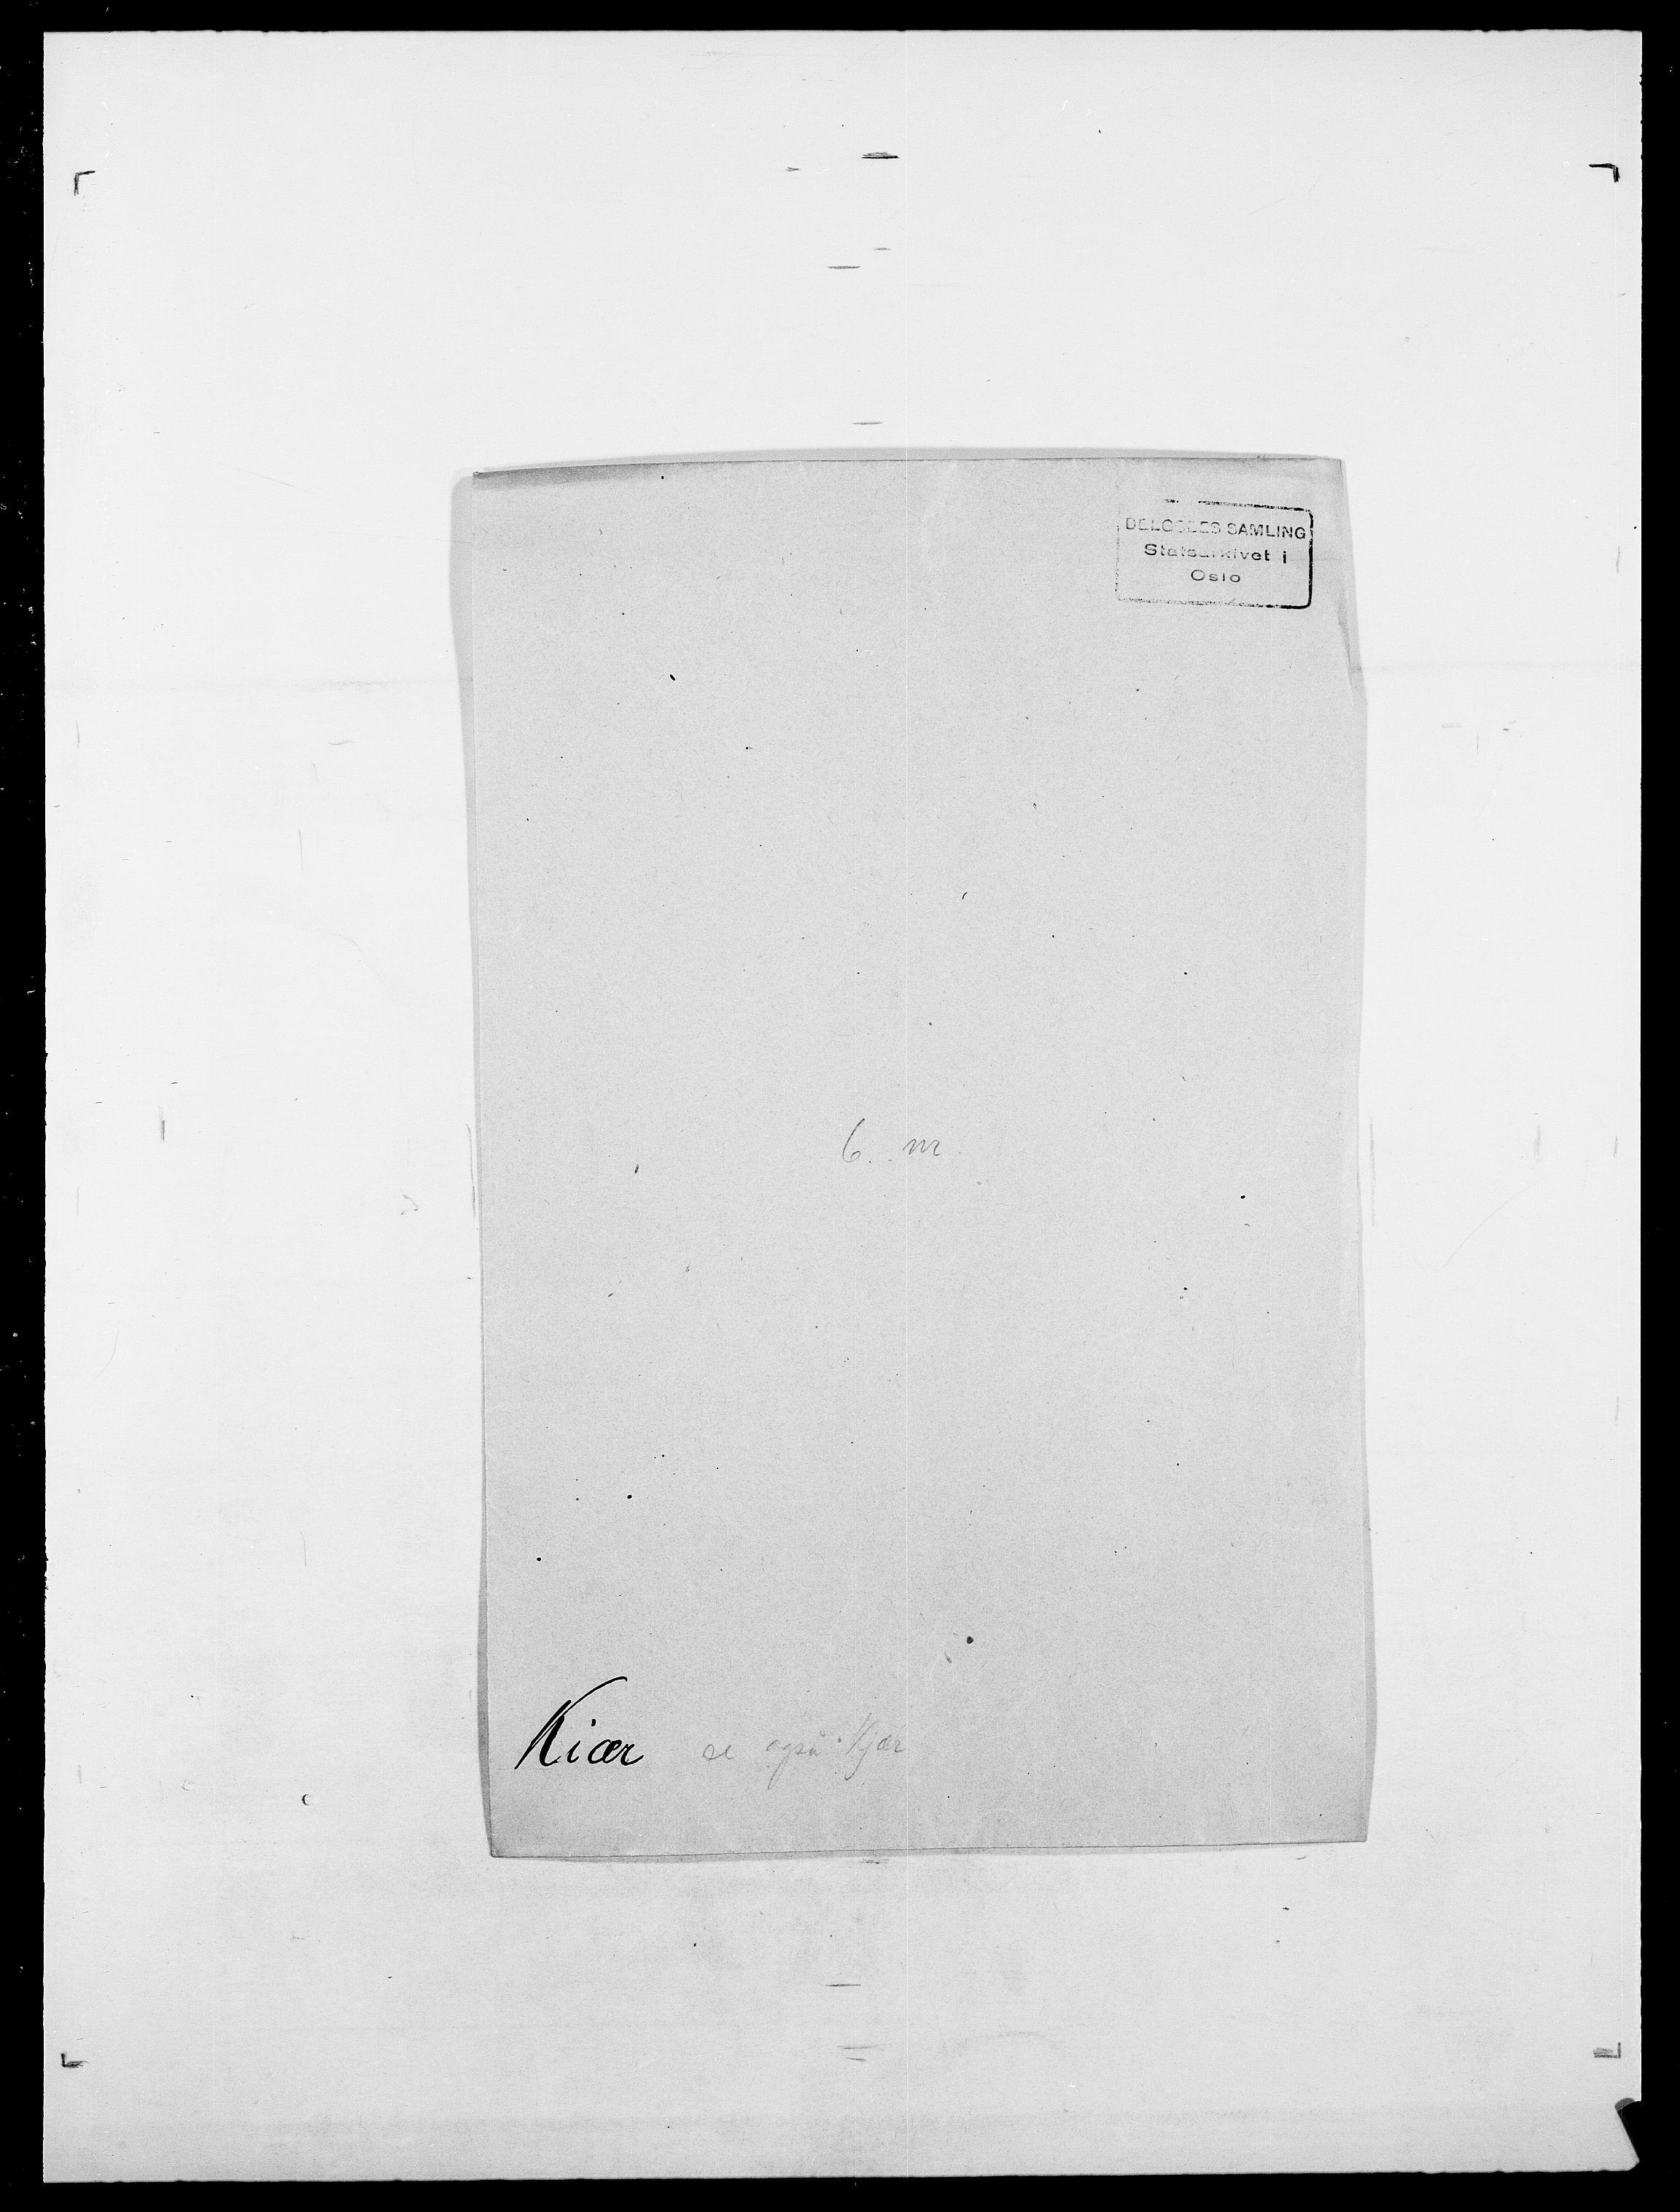 SAO, Delgobe, Charles Antoine - samling, D/Da/L0020: Irgens - Kjøsterud, s. 683